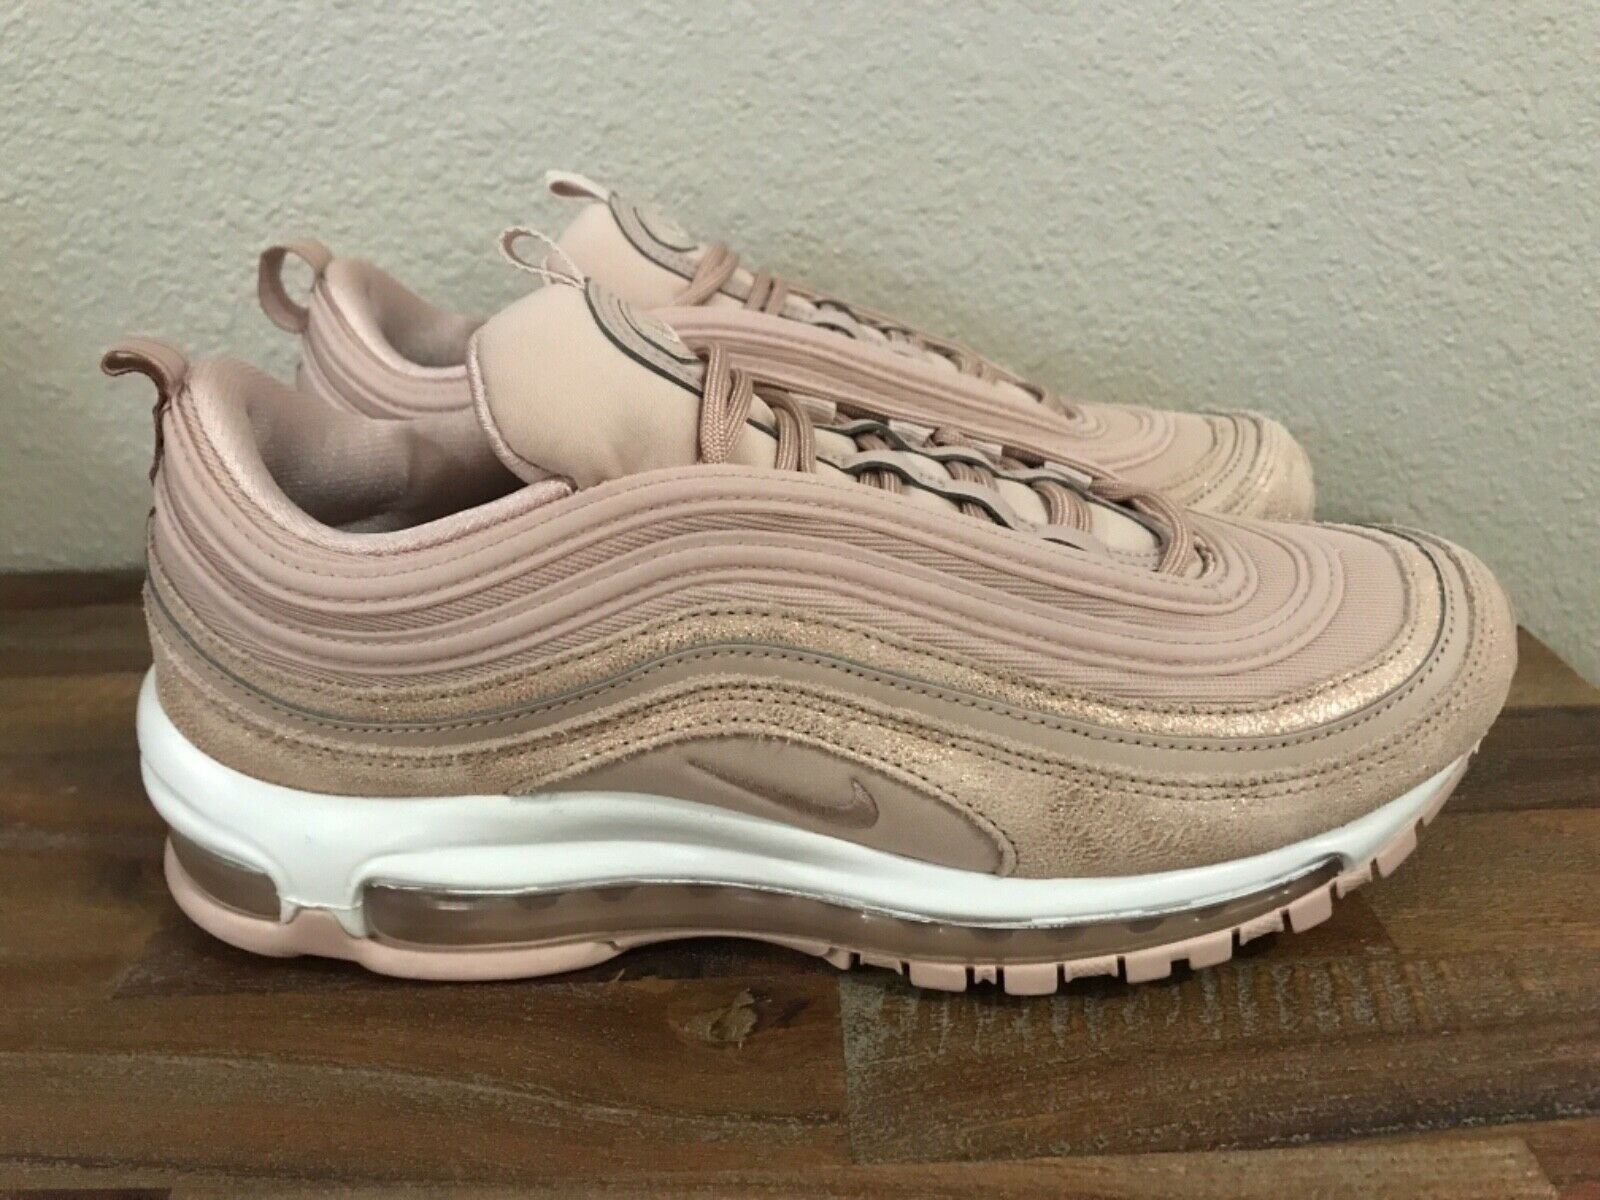 Nike Air Max 97 Beige Pink Light Bone Women Shoes [921733